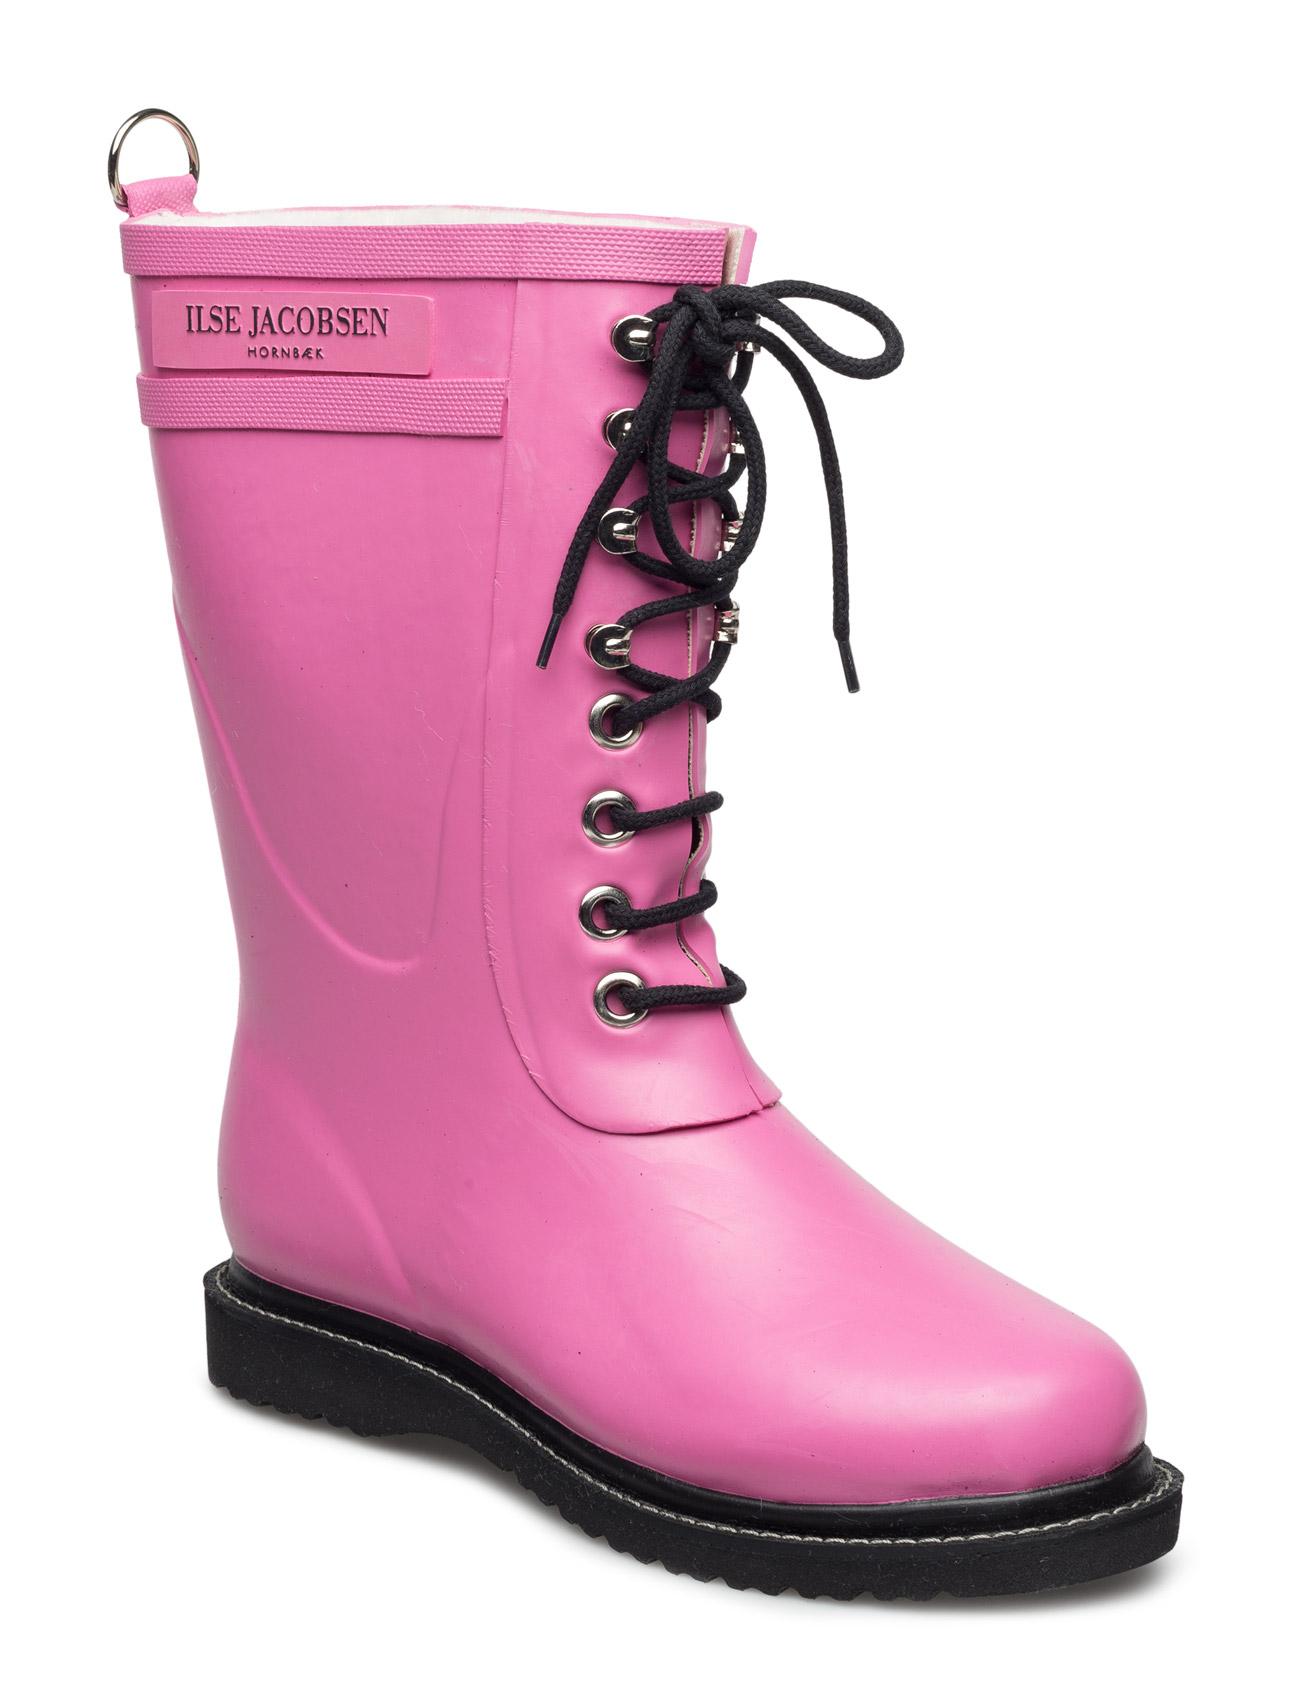 Rain Boot - Mid Calf, Classic With Laces Ilse Jacobsen Støvler til Damer i Lyserød